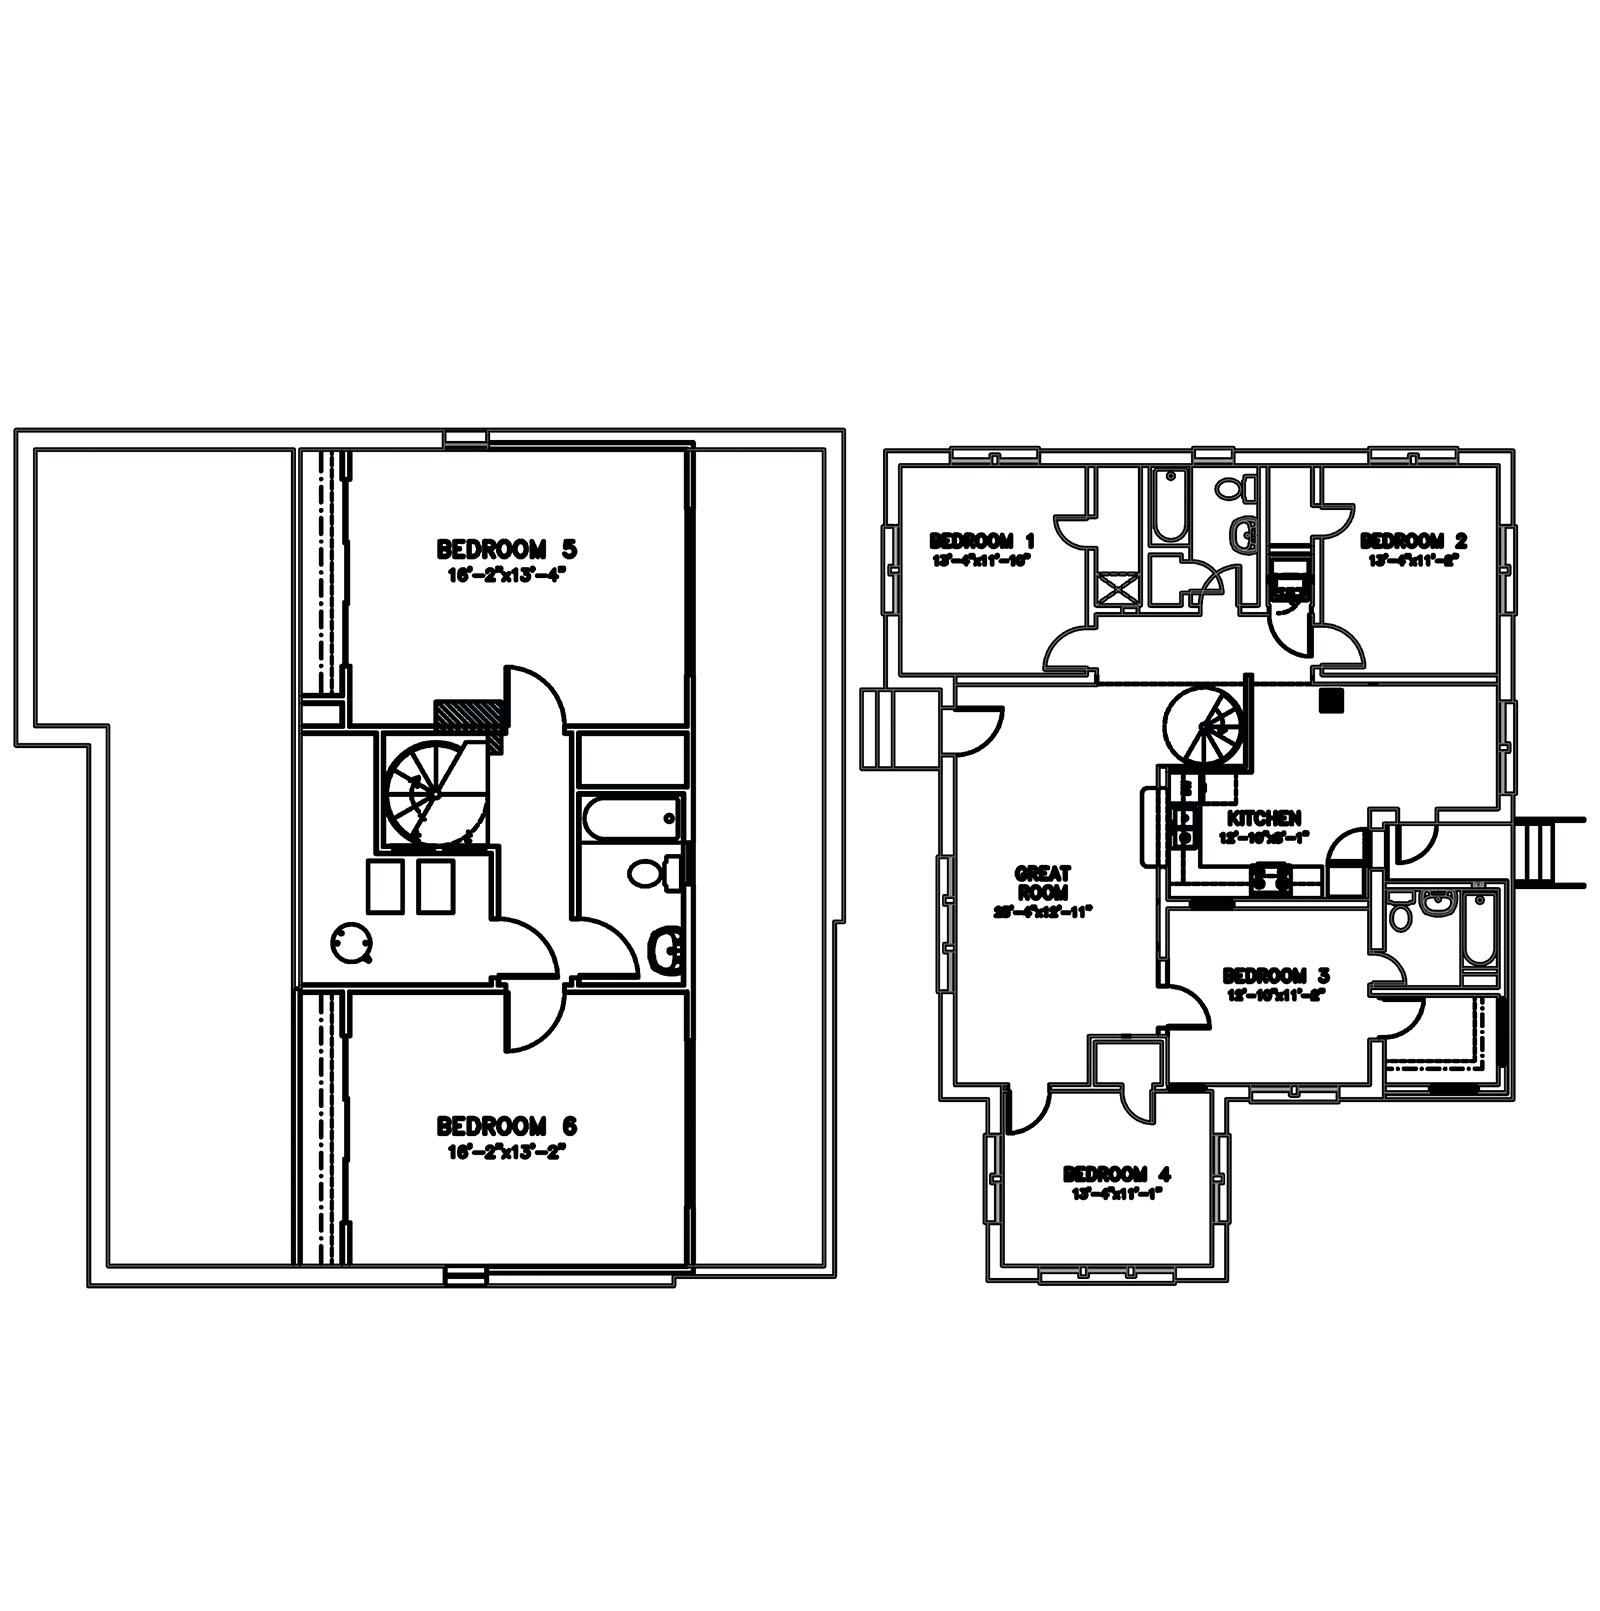 703 House Floor Plan